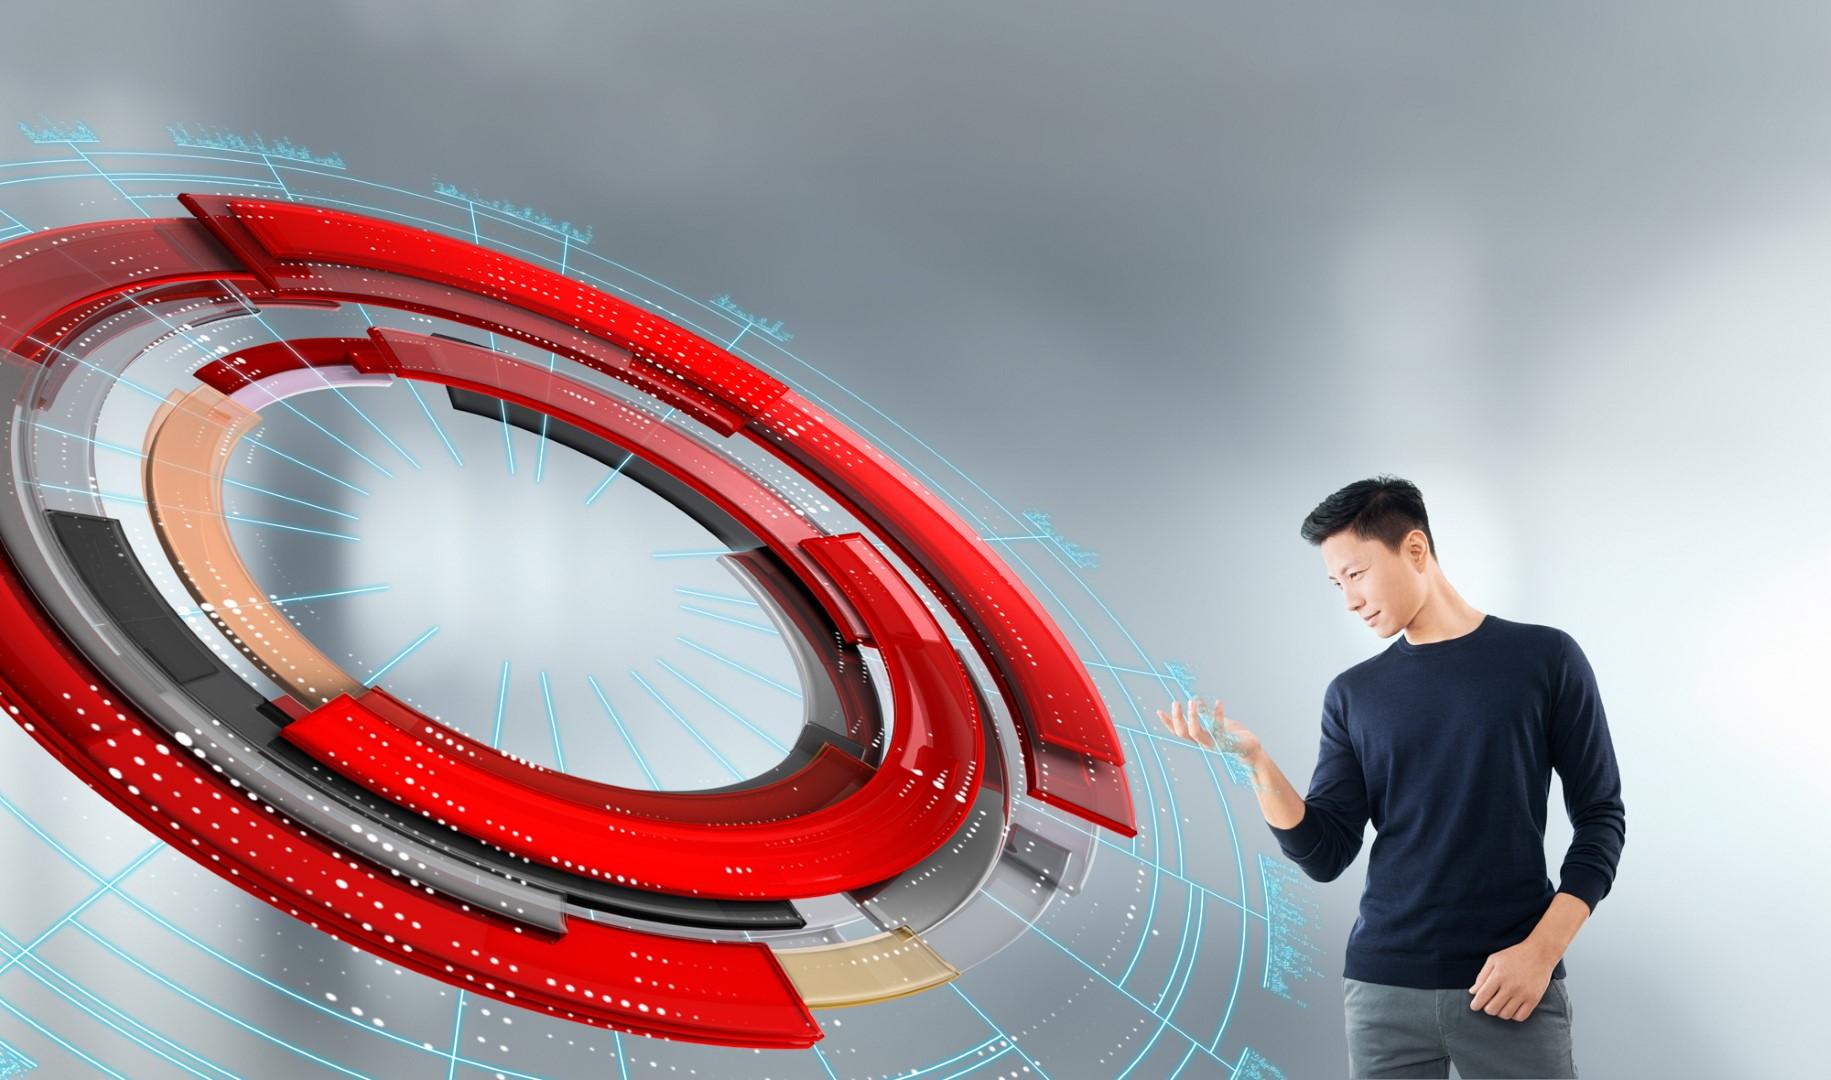 Main visual : Reap the benefits of SAP S/4HANA migration with Fujitsu PRIMEFLEX for SAP Environments